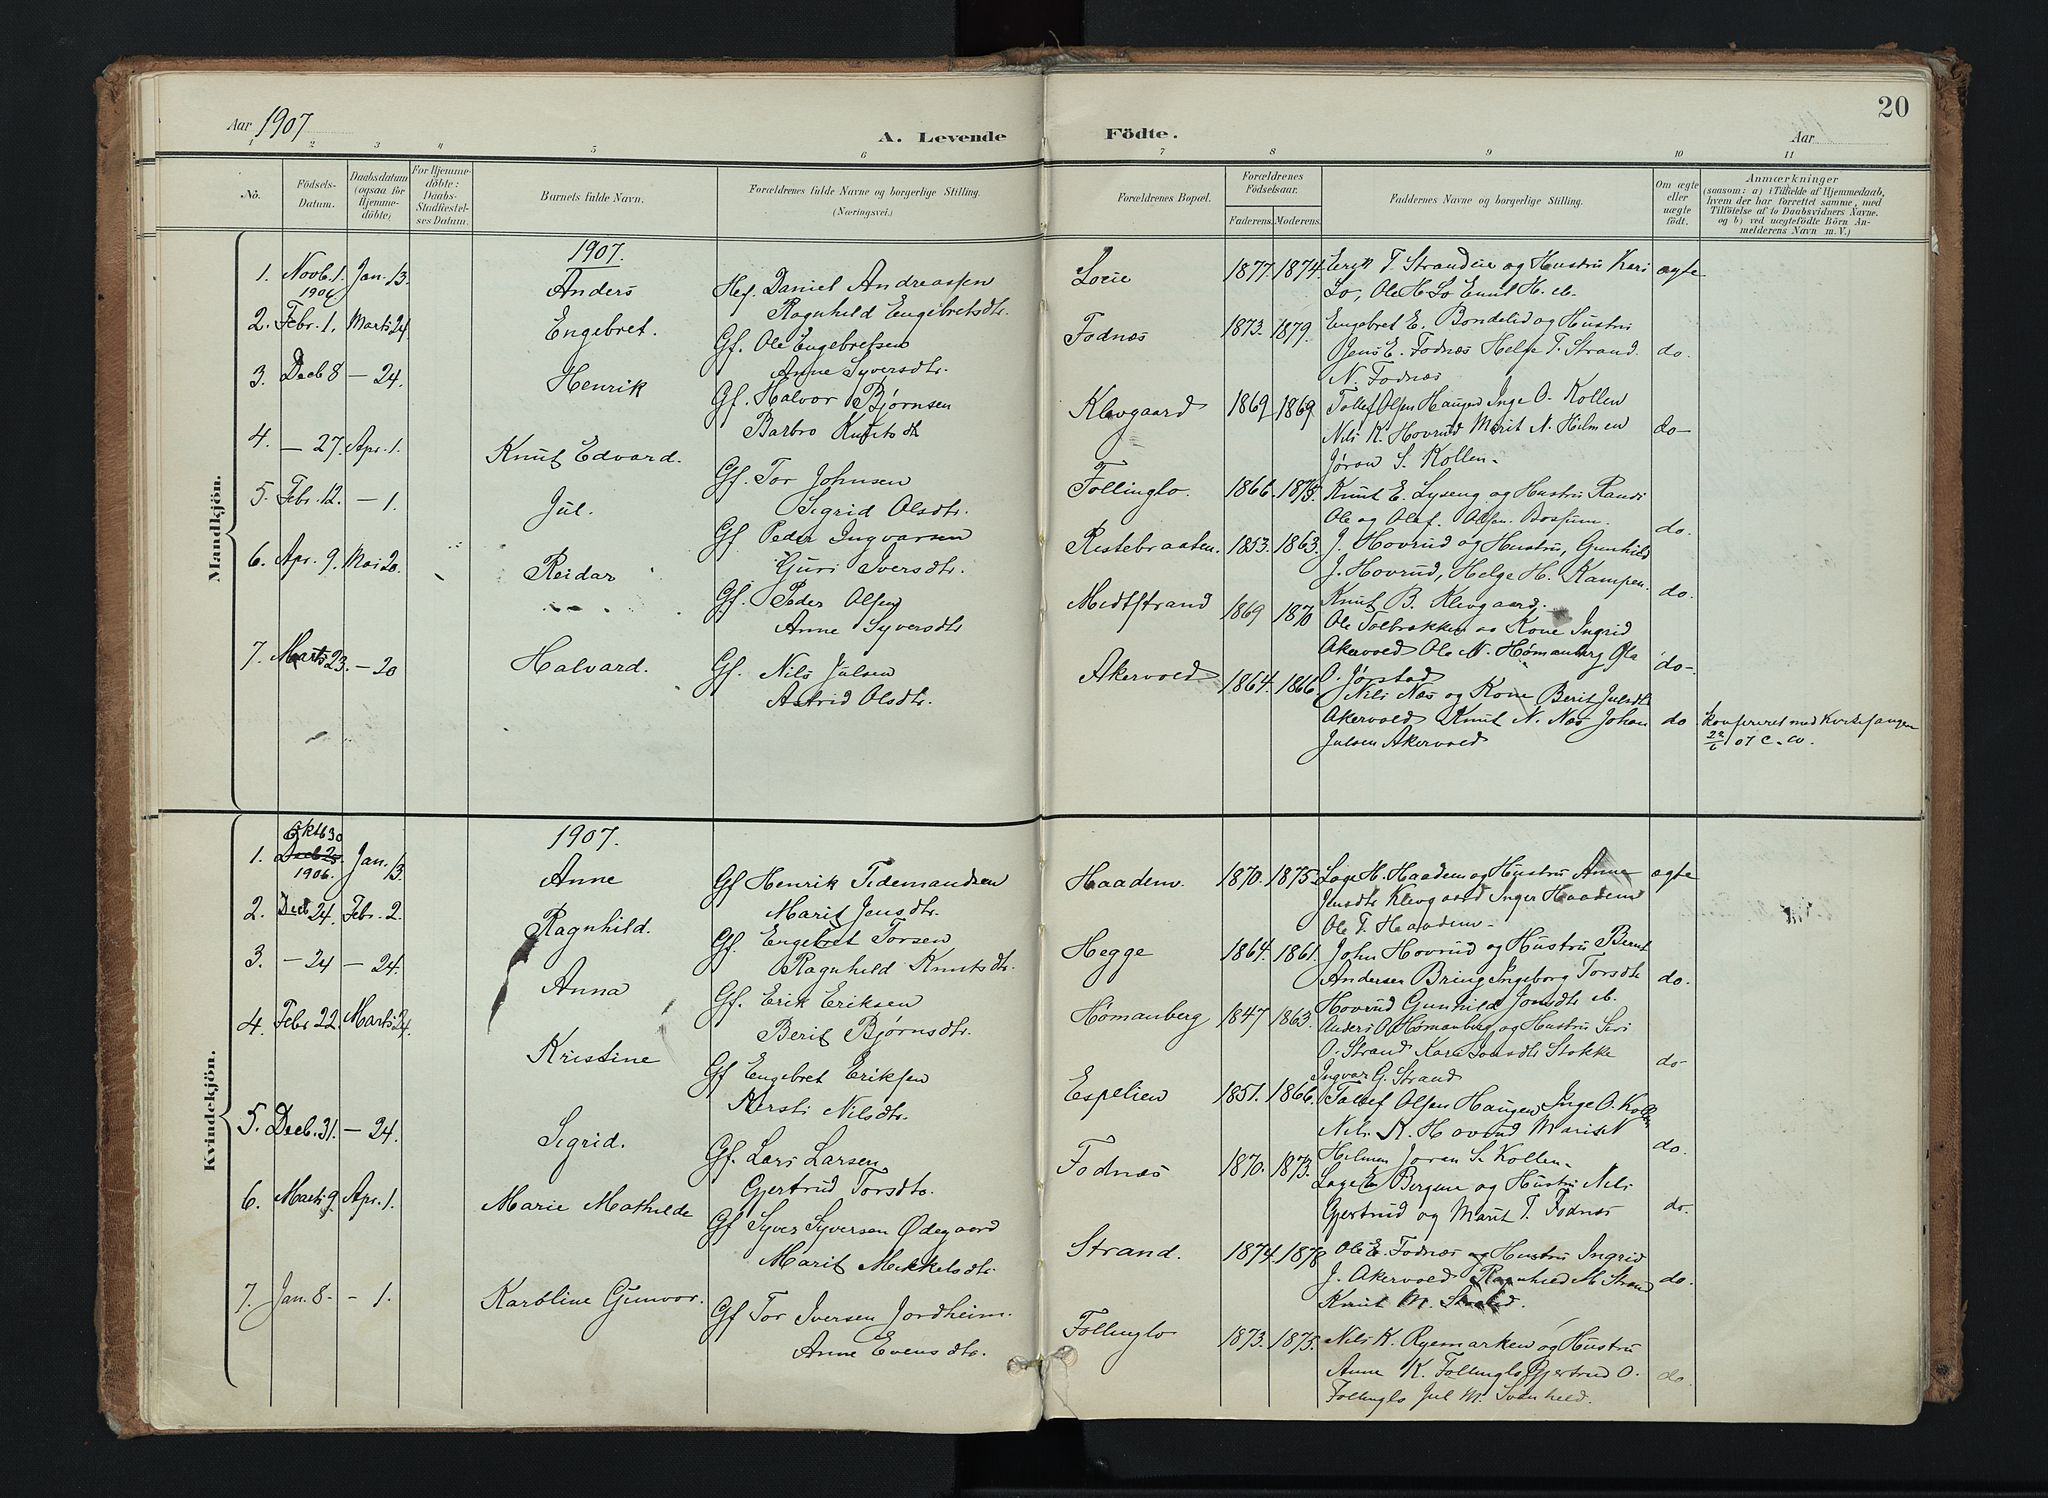 SAH, Nord-Aurdal prestekontor, Ministerialbok nr. 16, 1897-1925, s. 20